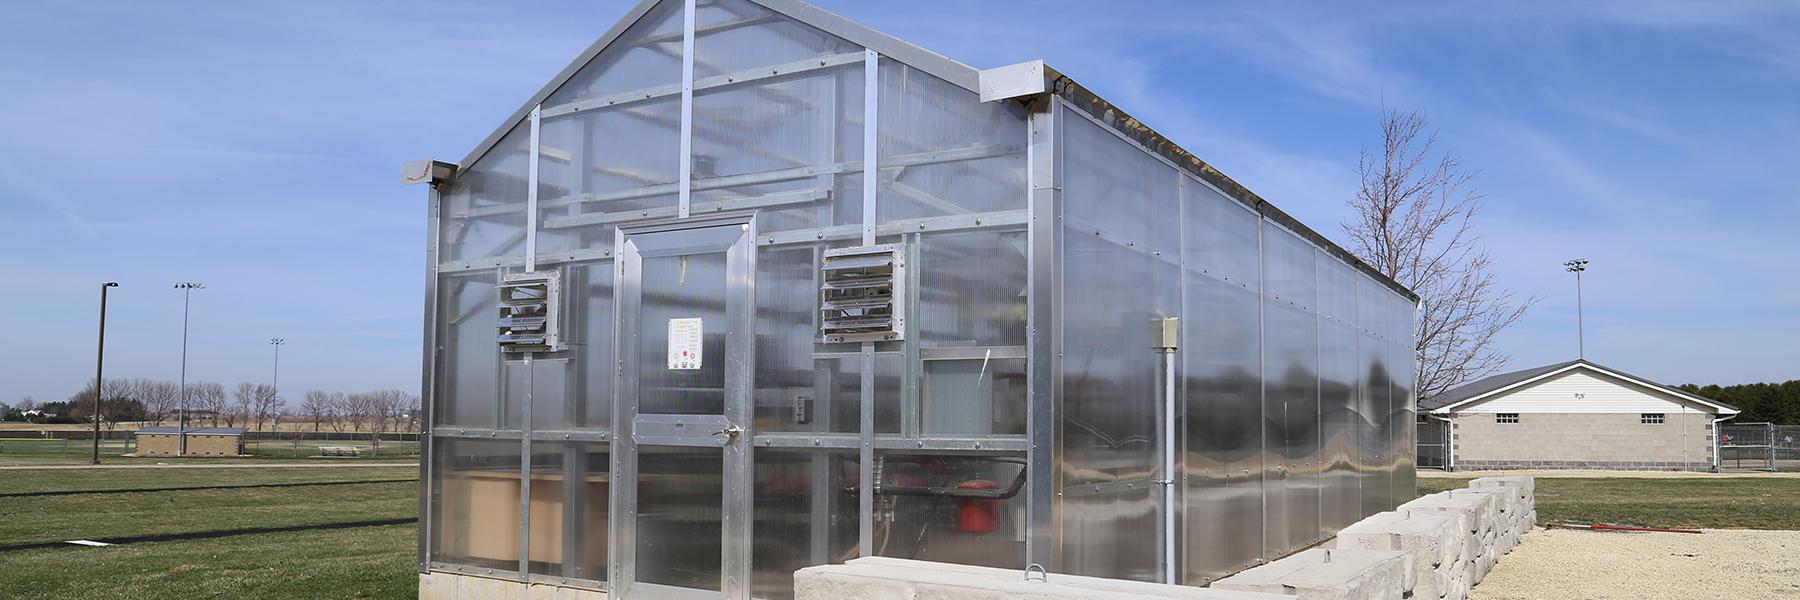 Educator greenhouse interior